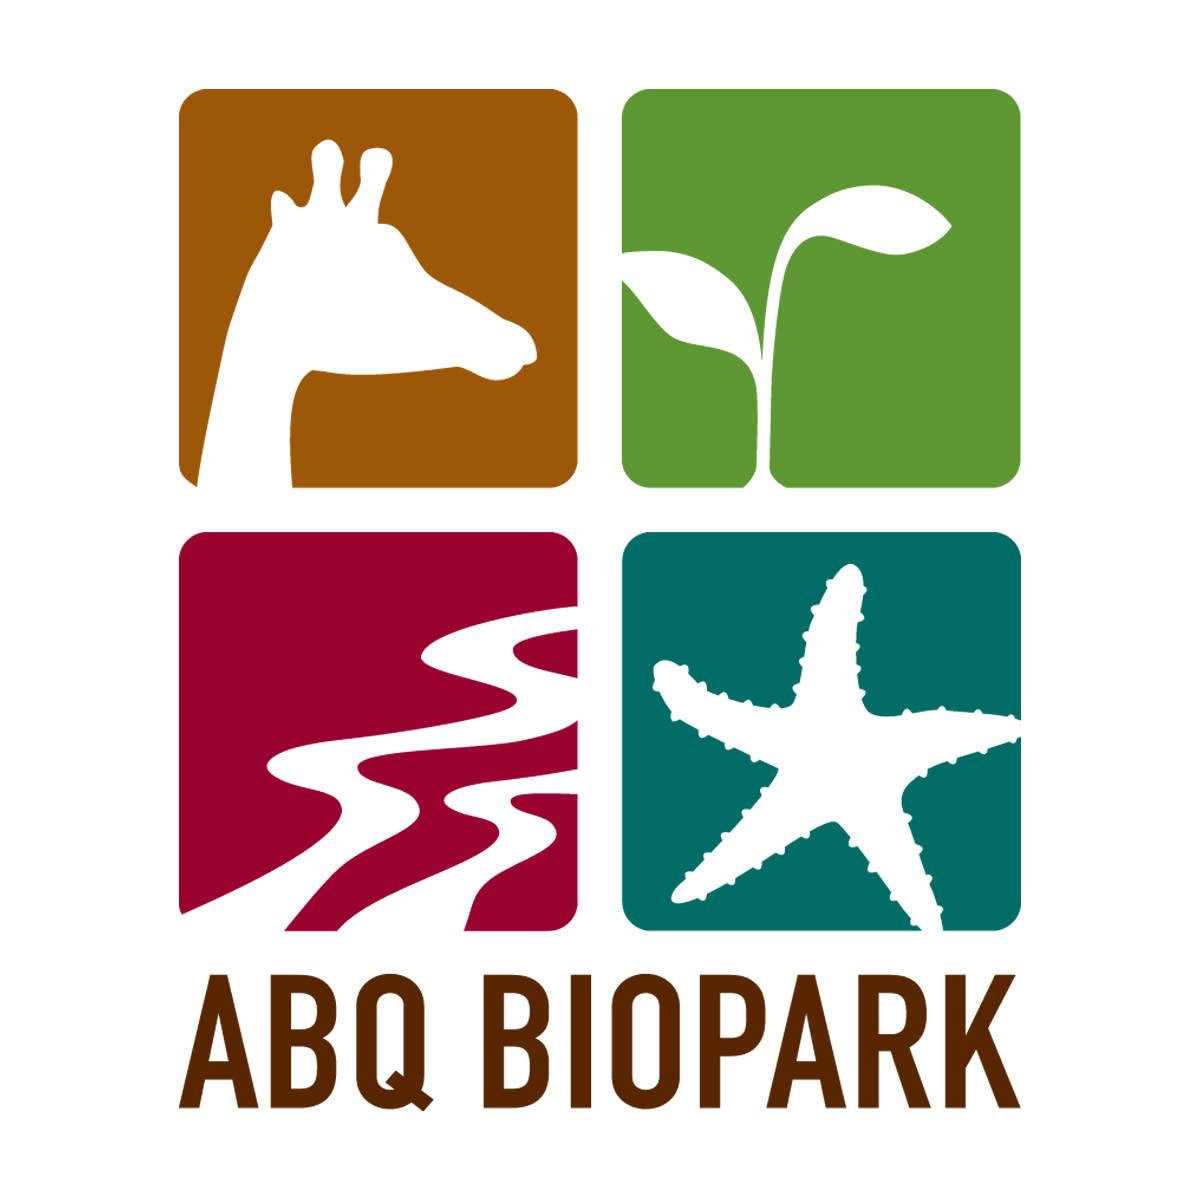 botanic garden abq biopark - Abq Biopark Botanic Garden